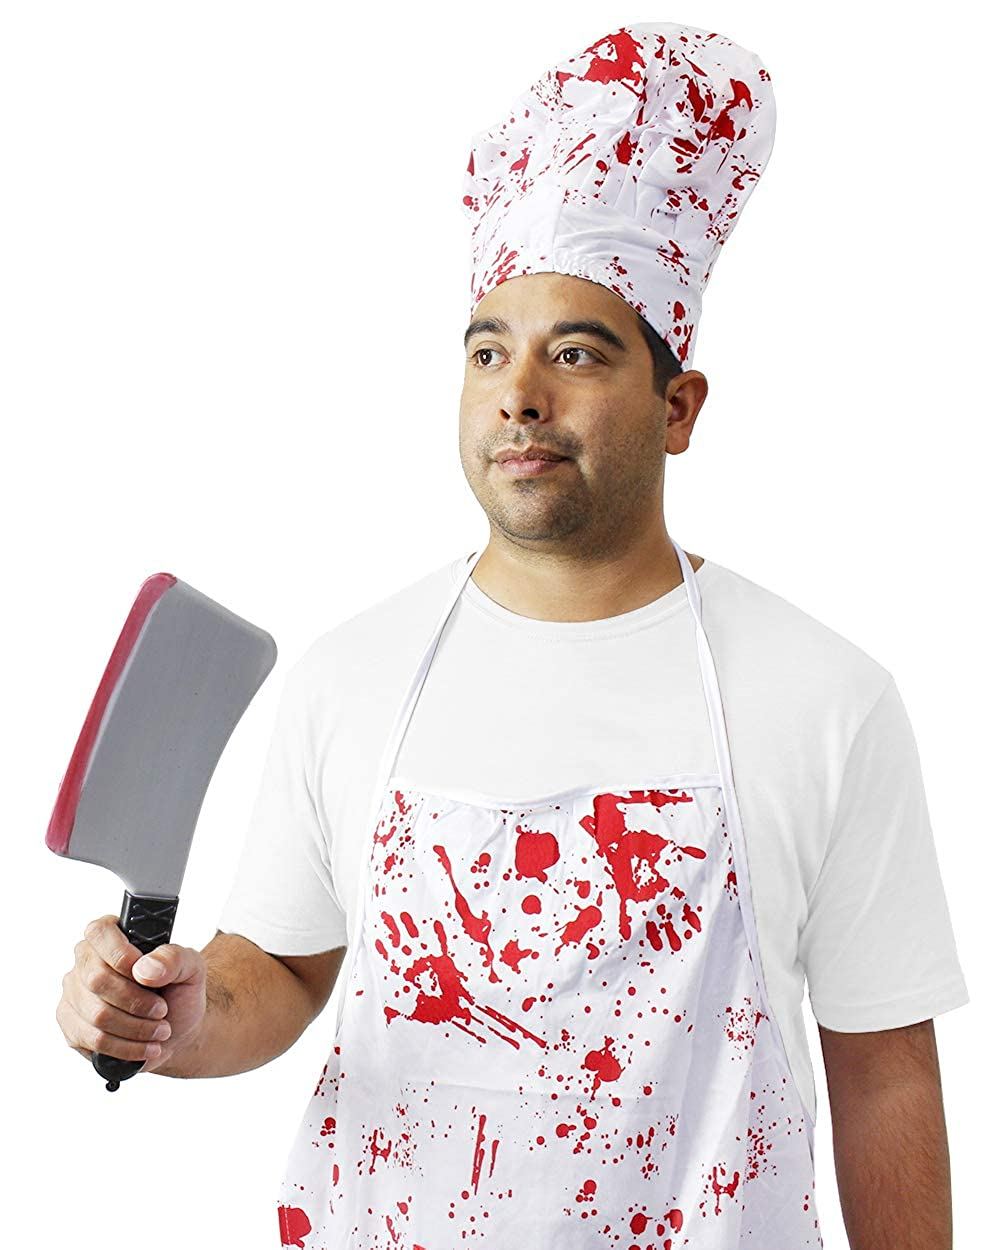 Amazon.com: Halloween Bloody Butcher disfraz – 3 conjuntos ...